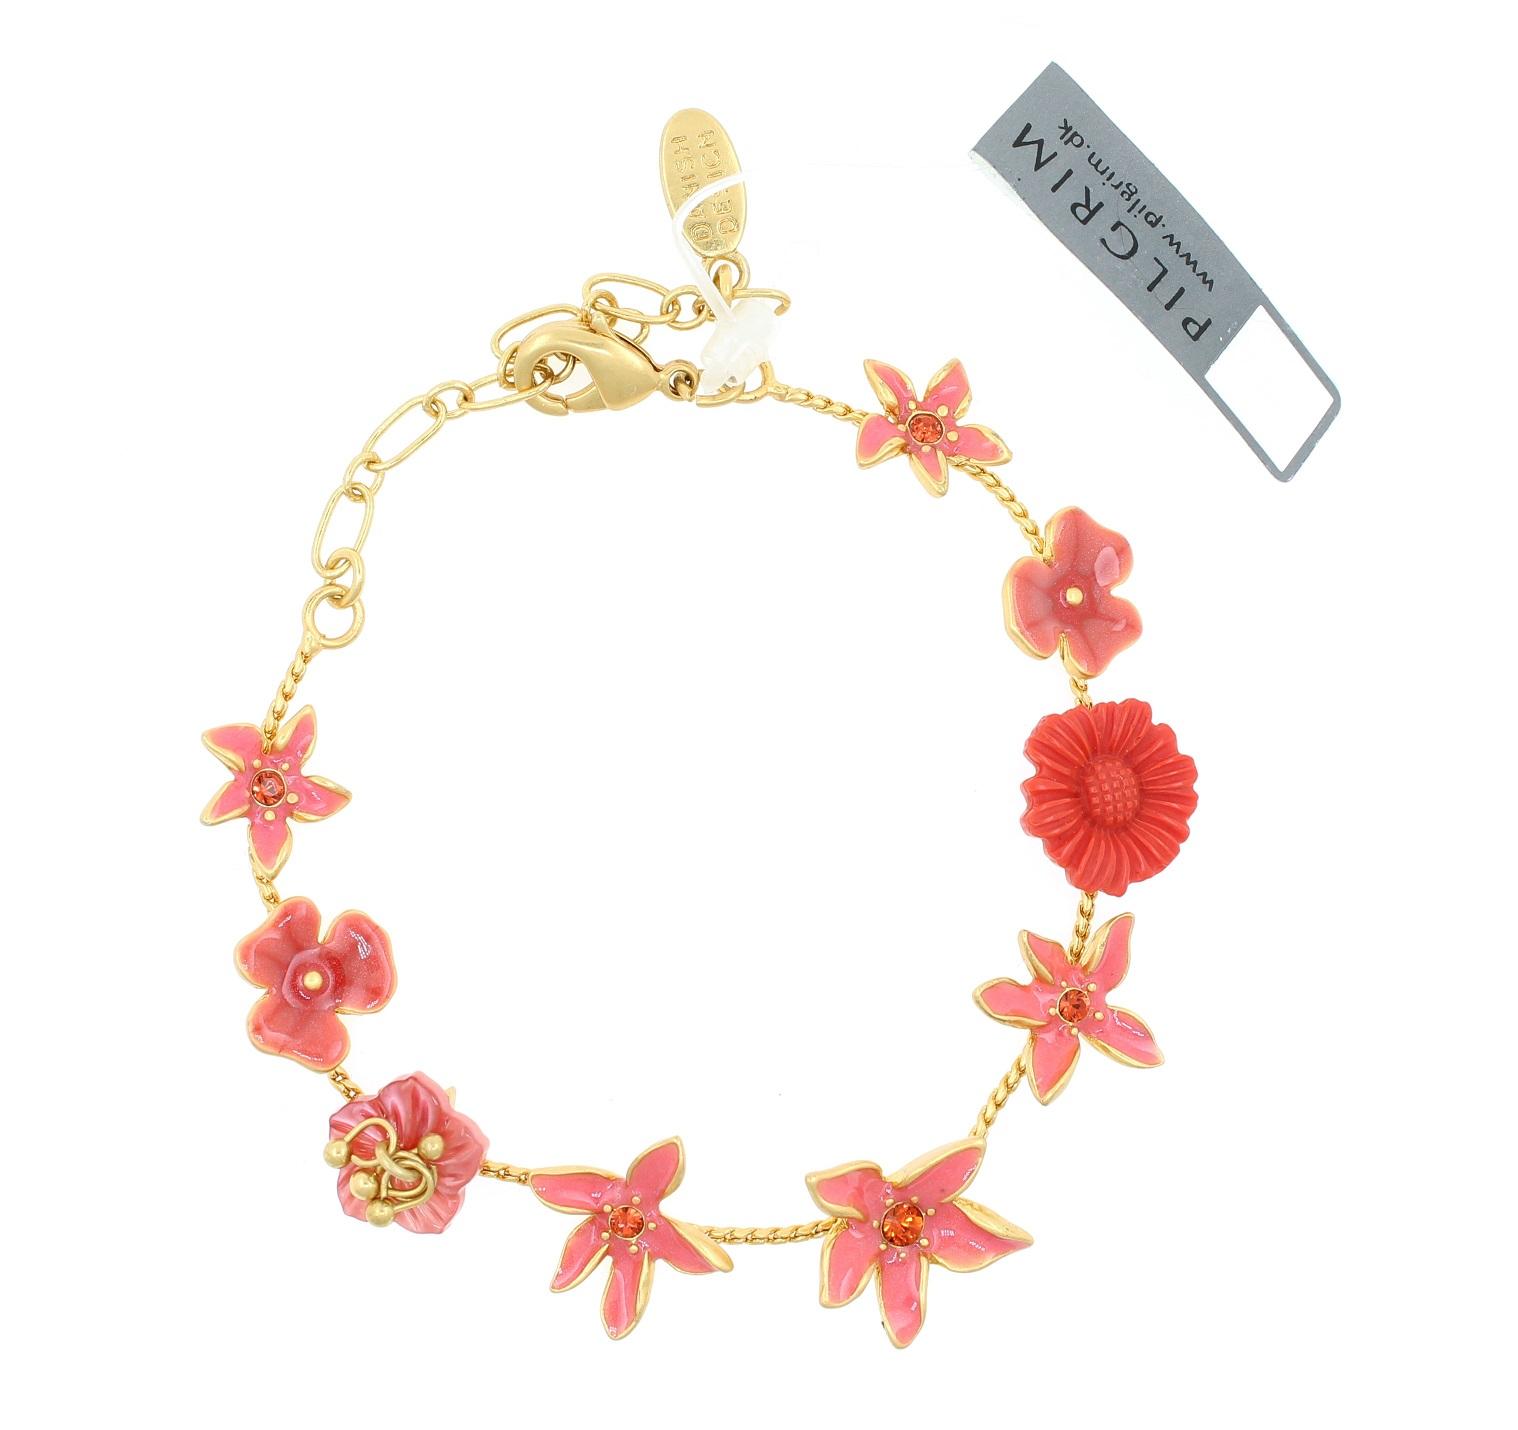 PILGRIM - Floral Delicacy - Floral Bracelet - Gold Plate/Coral BNWT